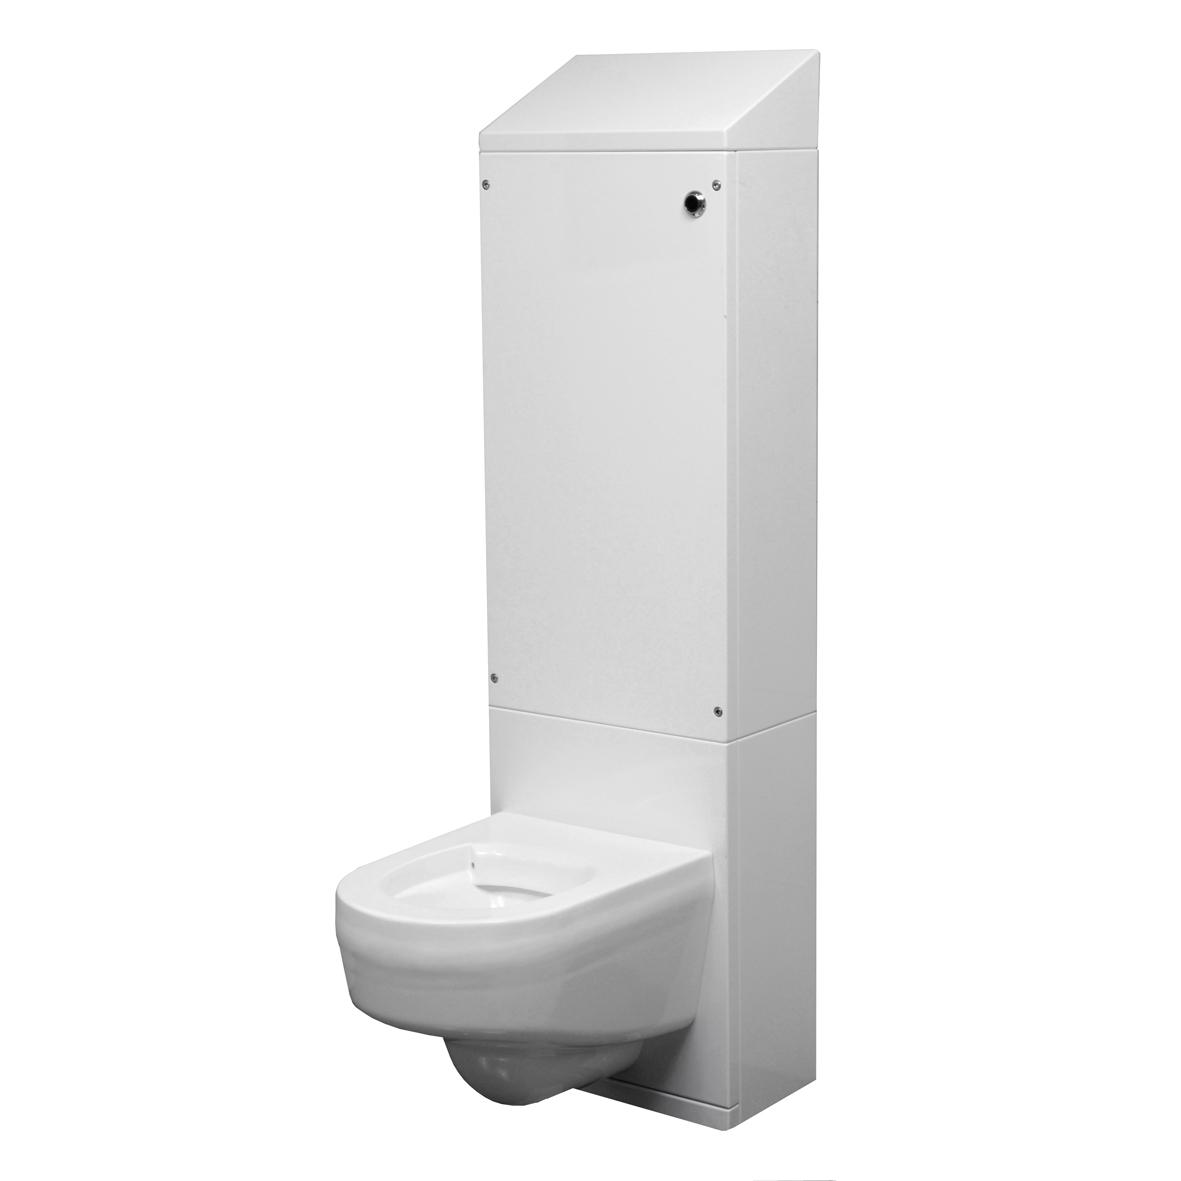 Heno WC modul (Vägg-Sluttande)